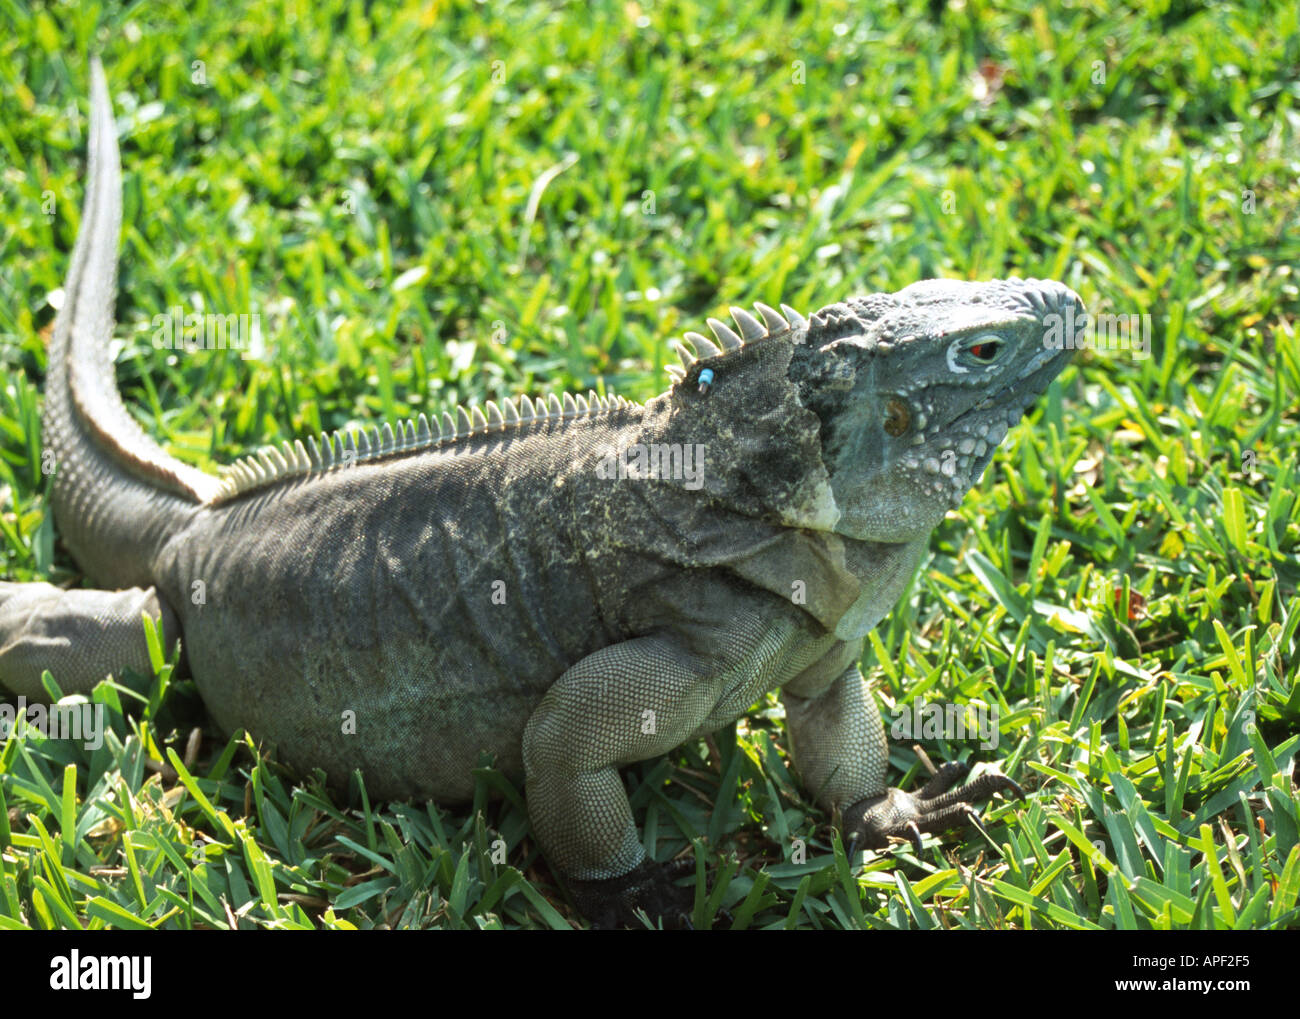 Blue Iguana Queen Elizabeth II Botanical Gardens Grand Cayman BWI Caribbean